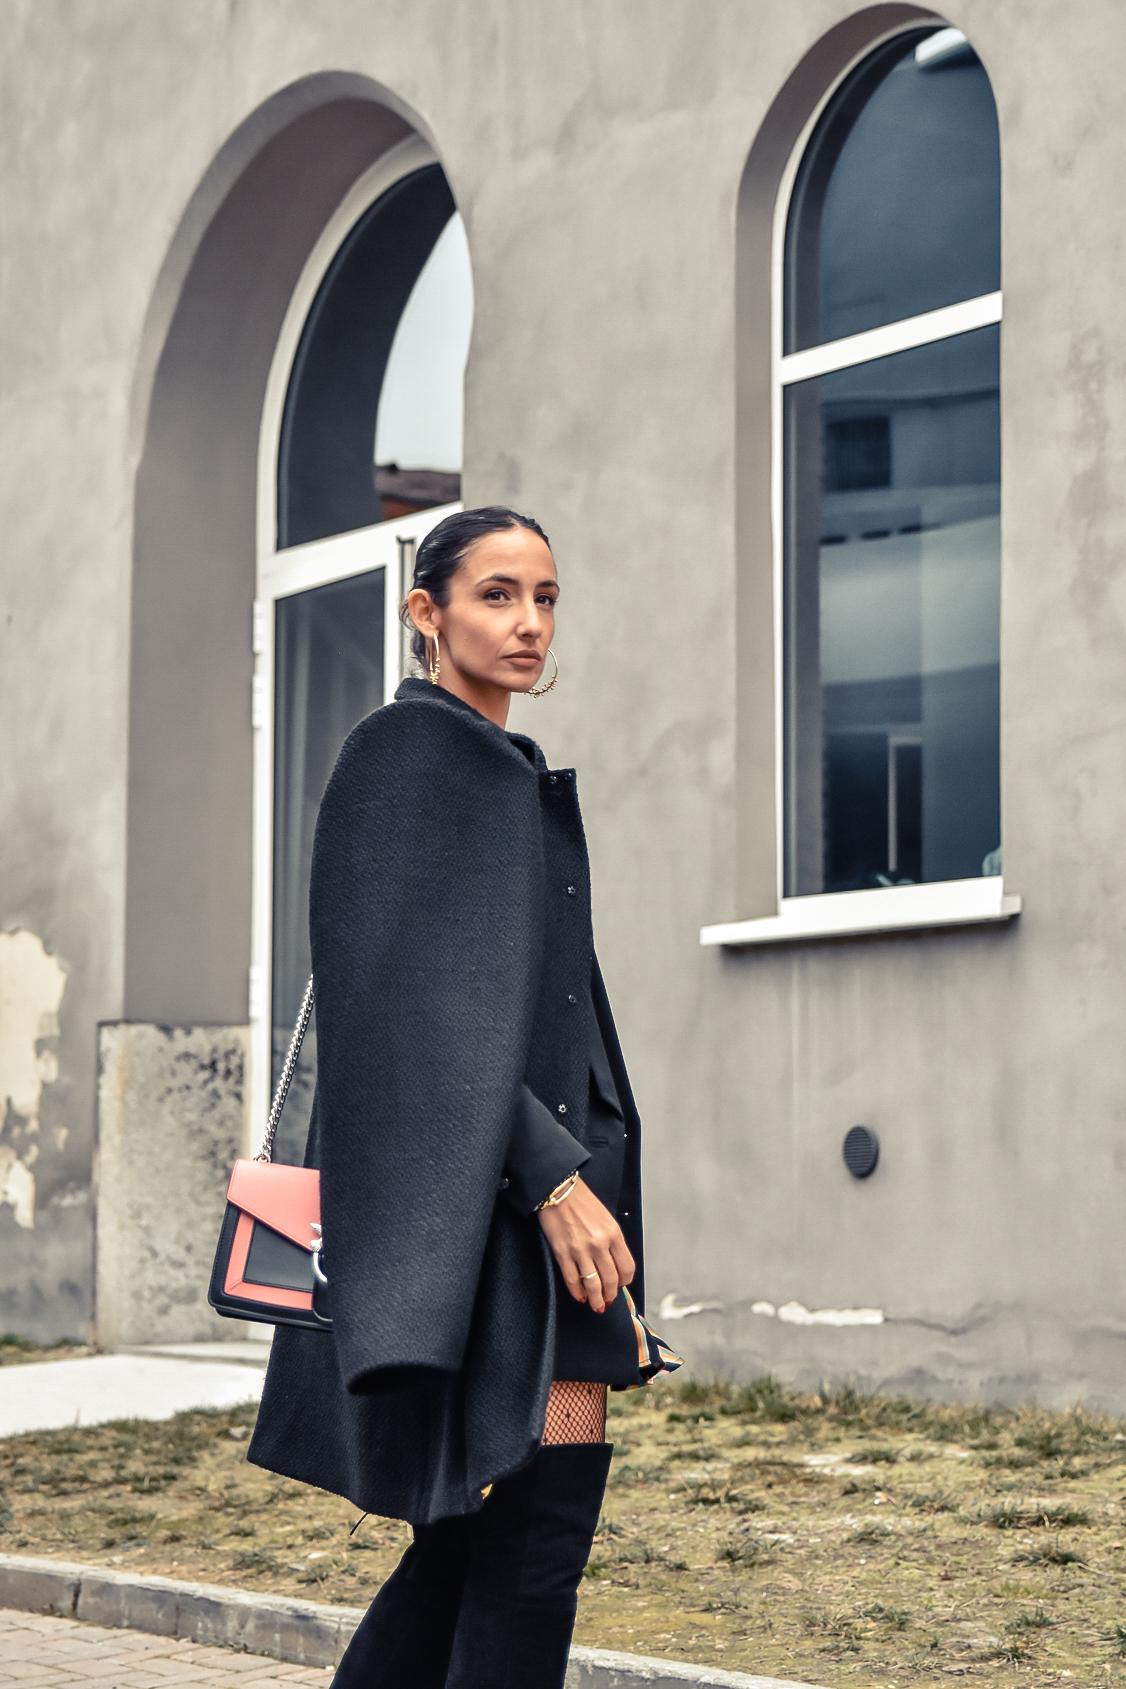 el-blog-de-silvia-fashion-blogger-street-style-mfw-abrigo-negro-08